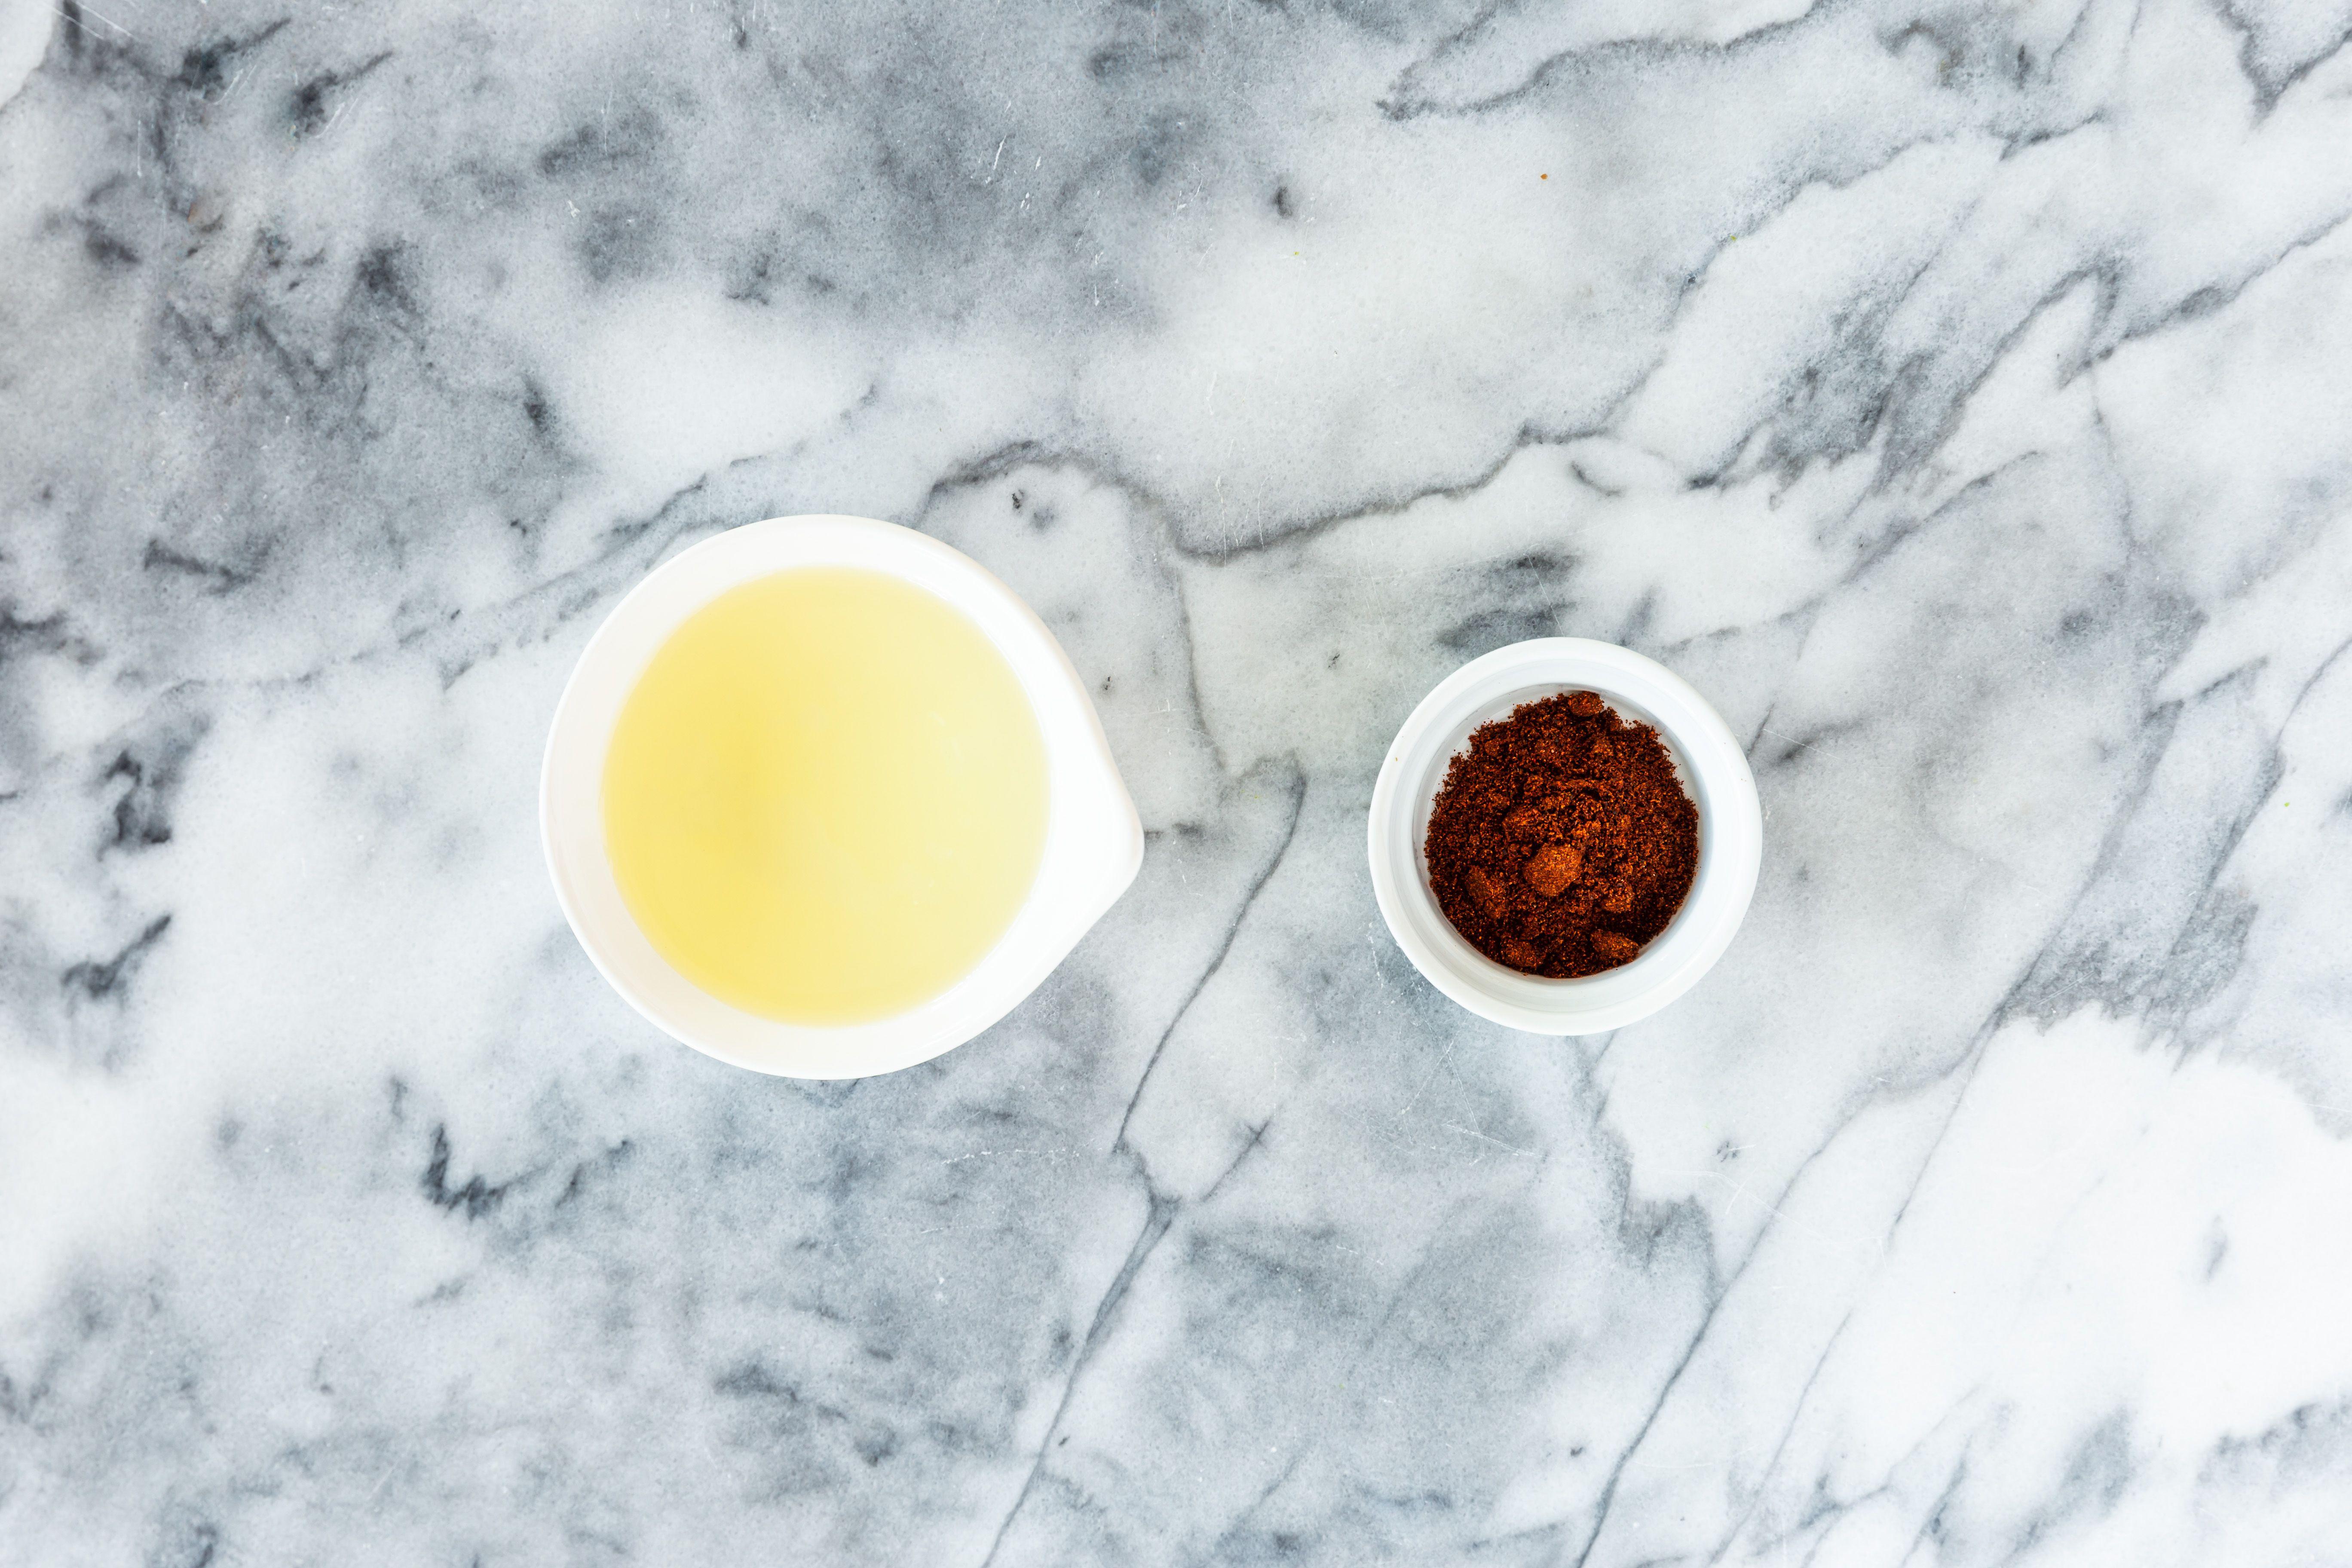 Chili powder and oil